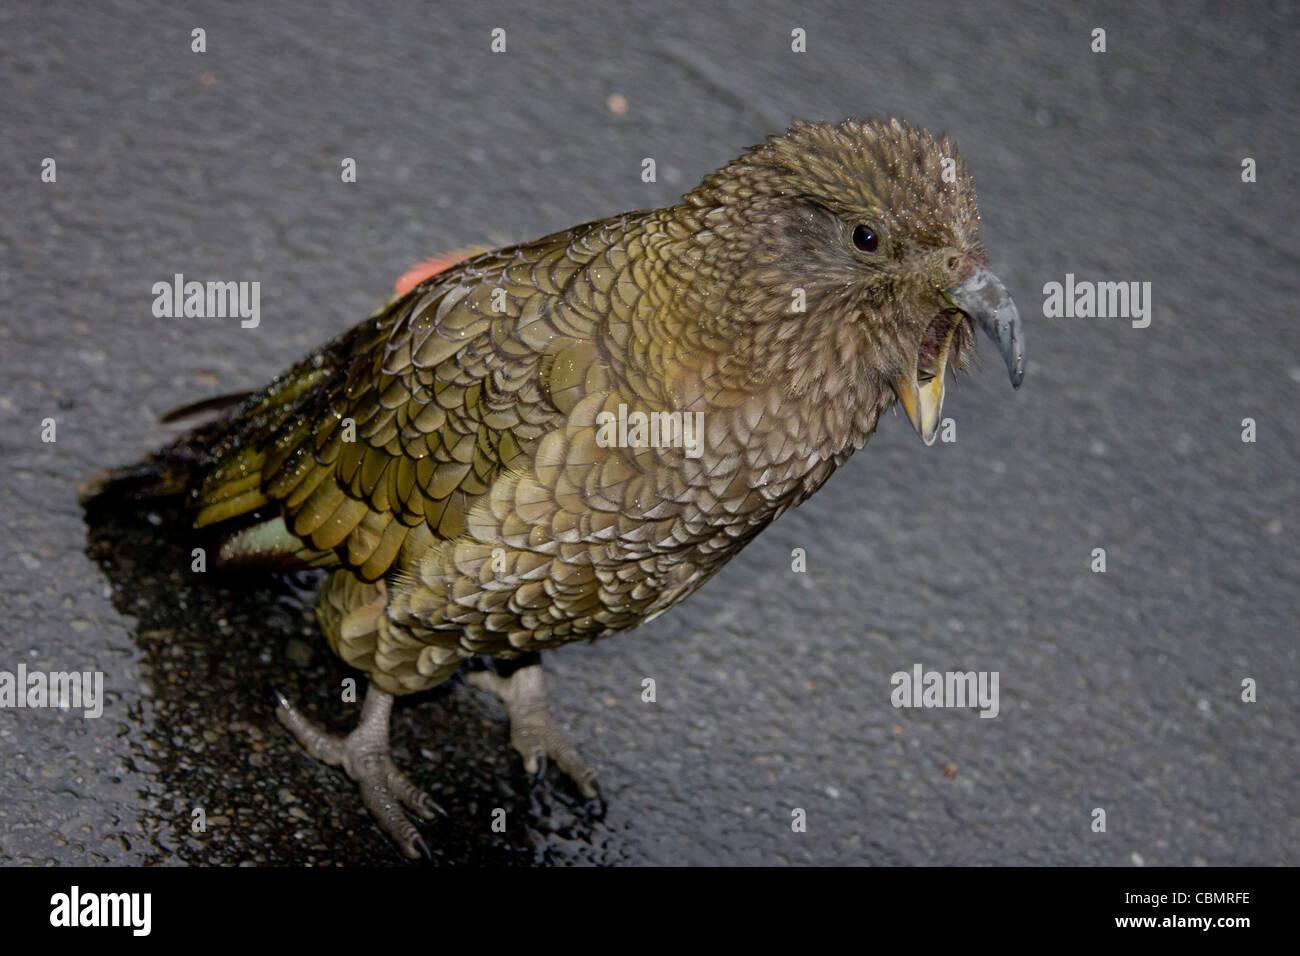 New Zealand kea mountain parrot standing with beak open Stock Photo